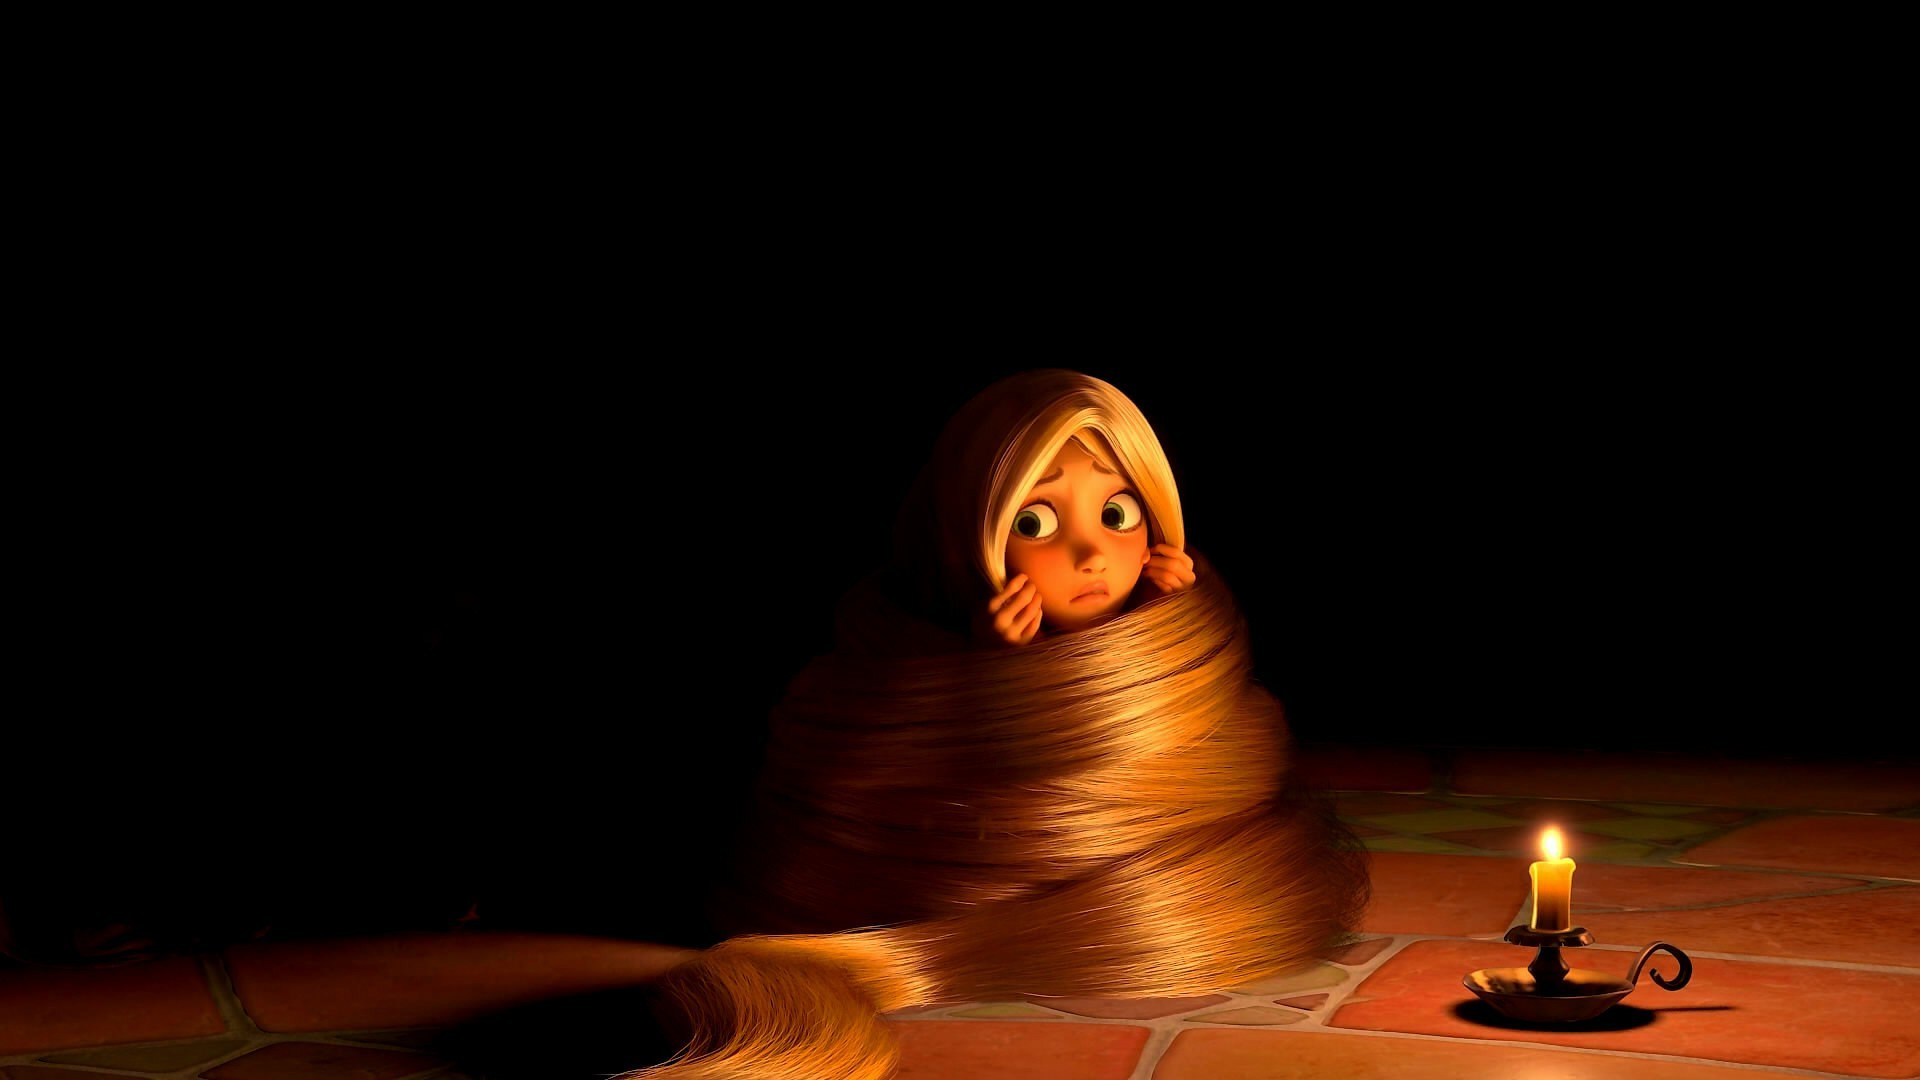 Animated Movies Black Background Candles Disney Rapunzel